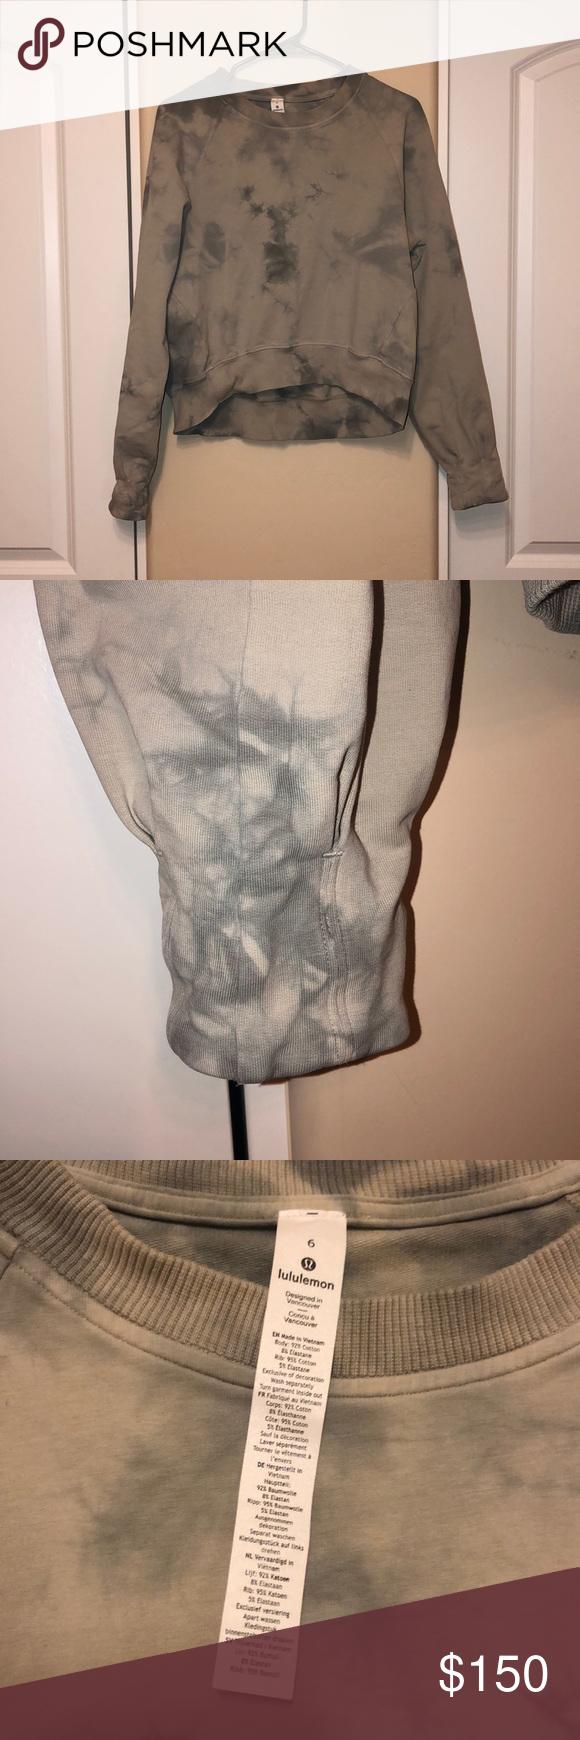 Lululemon Tie Dye Crew Neck Sweatshirt 6 Nwot Lulu Lululemon Tie Dye Shabori Style Crew Neck Sweat Shir Crew Neck Sweatshirt Clothes Design Two Piece Skirt Set [ 1740 x 580 Pixel ]